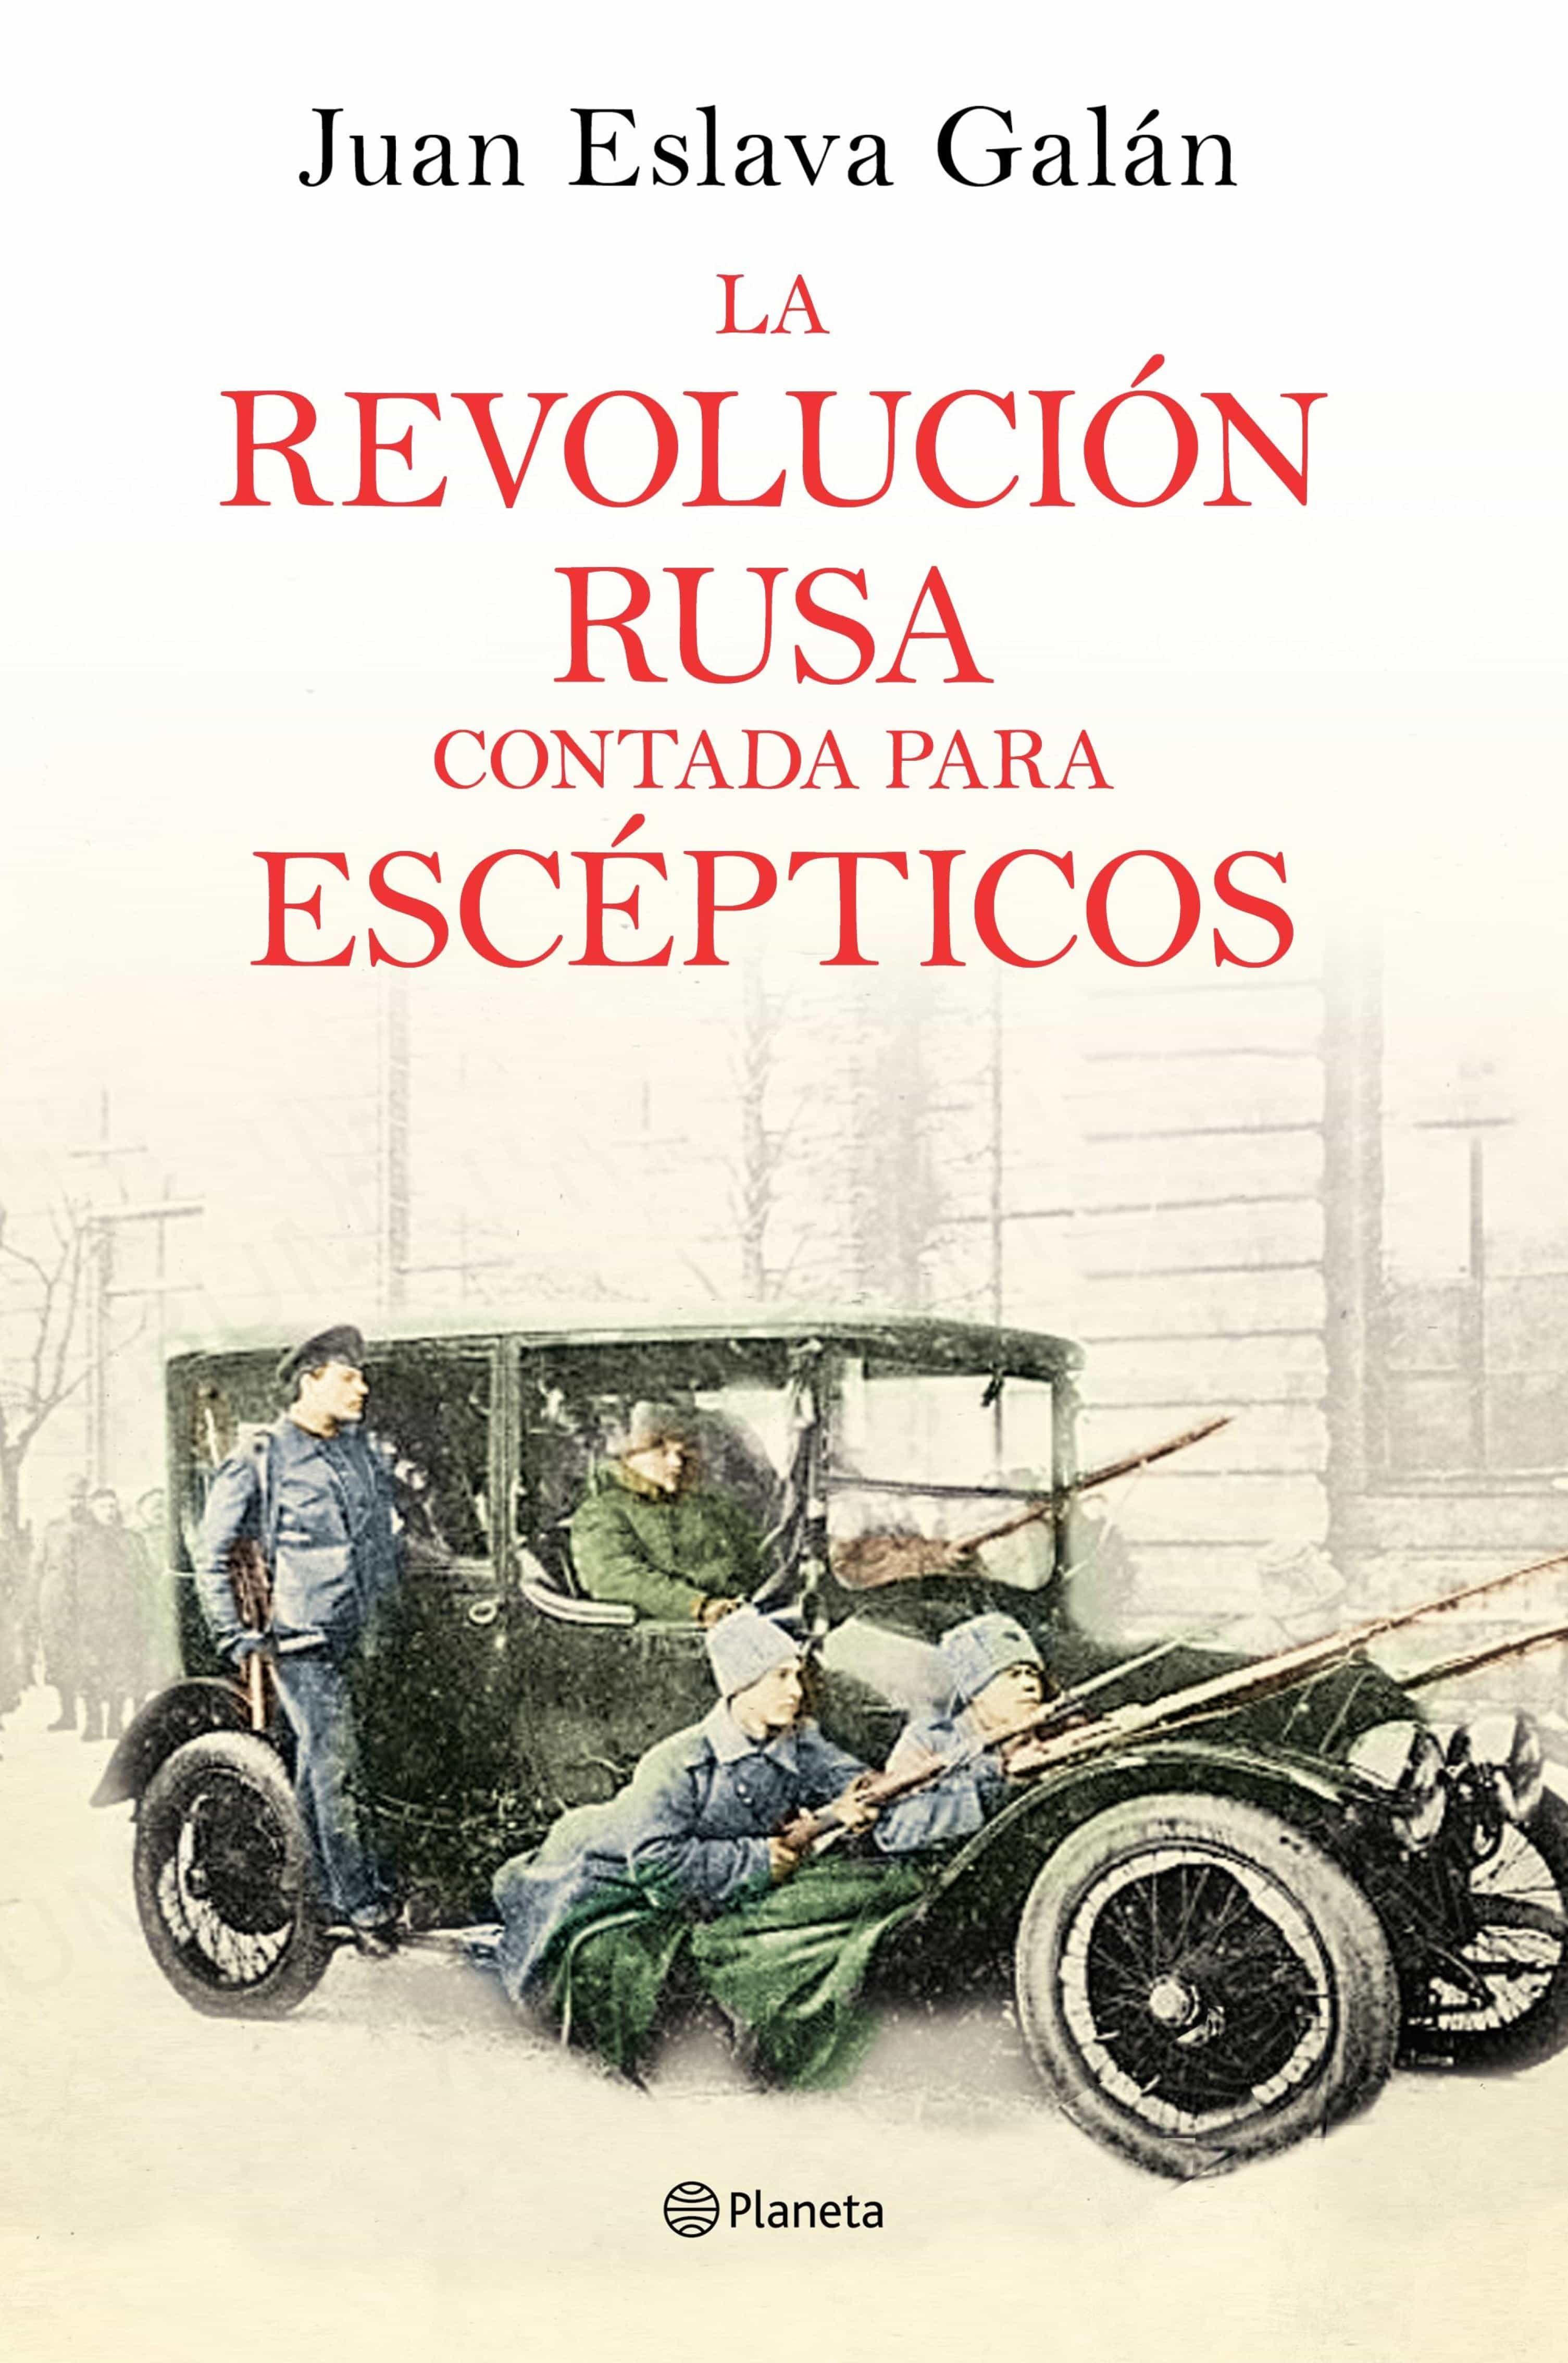 La Revolución Rusa Contada Para Escépticos   por Juan Eslava Galan